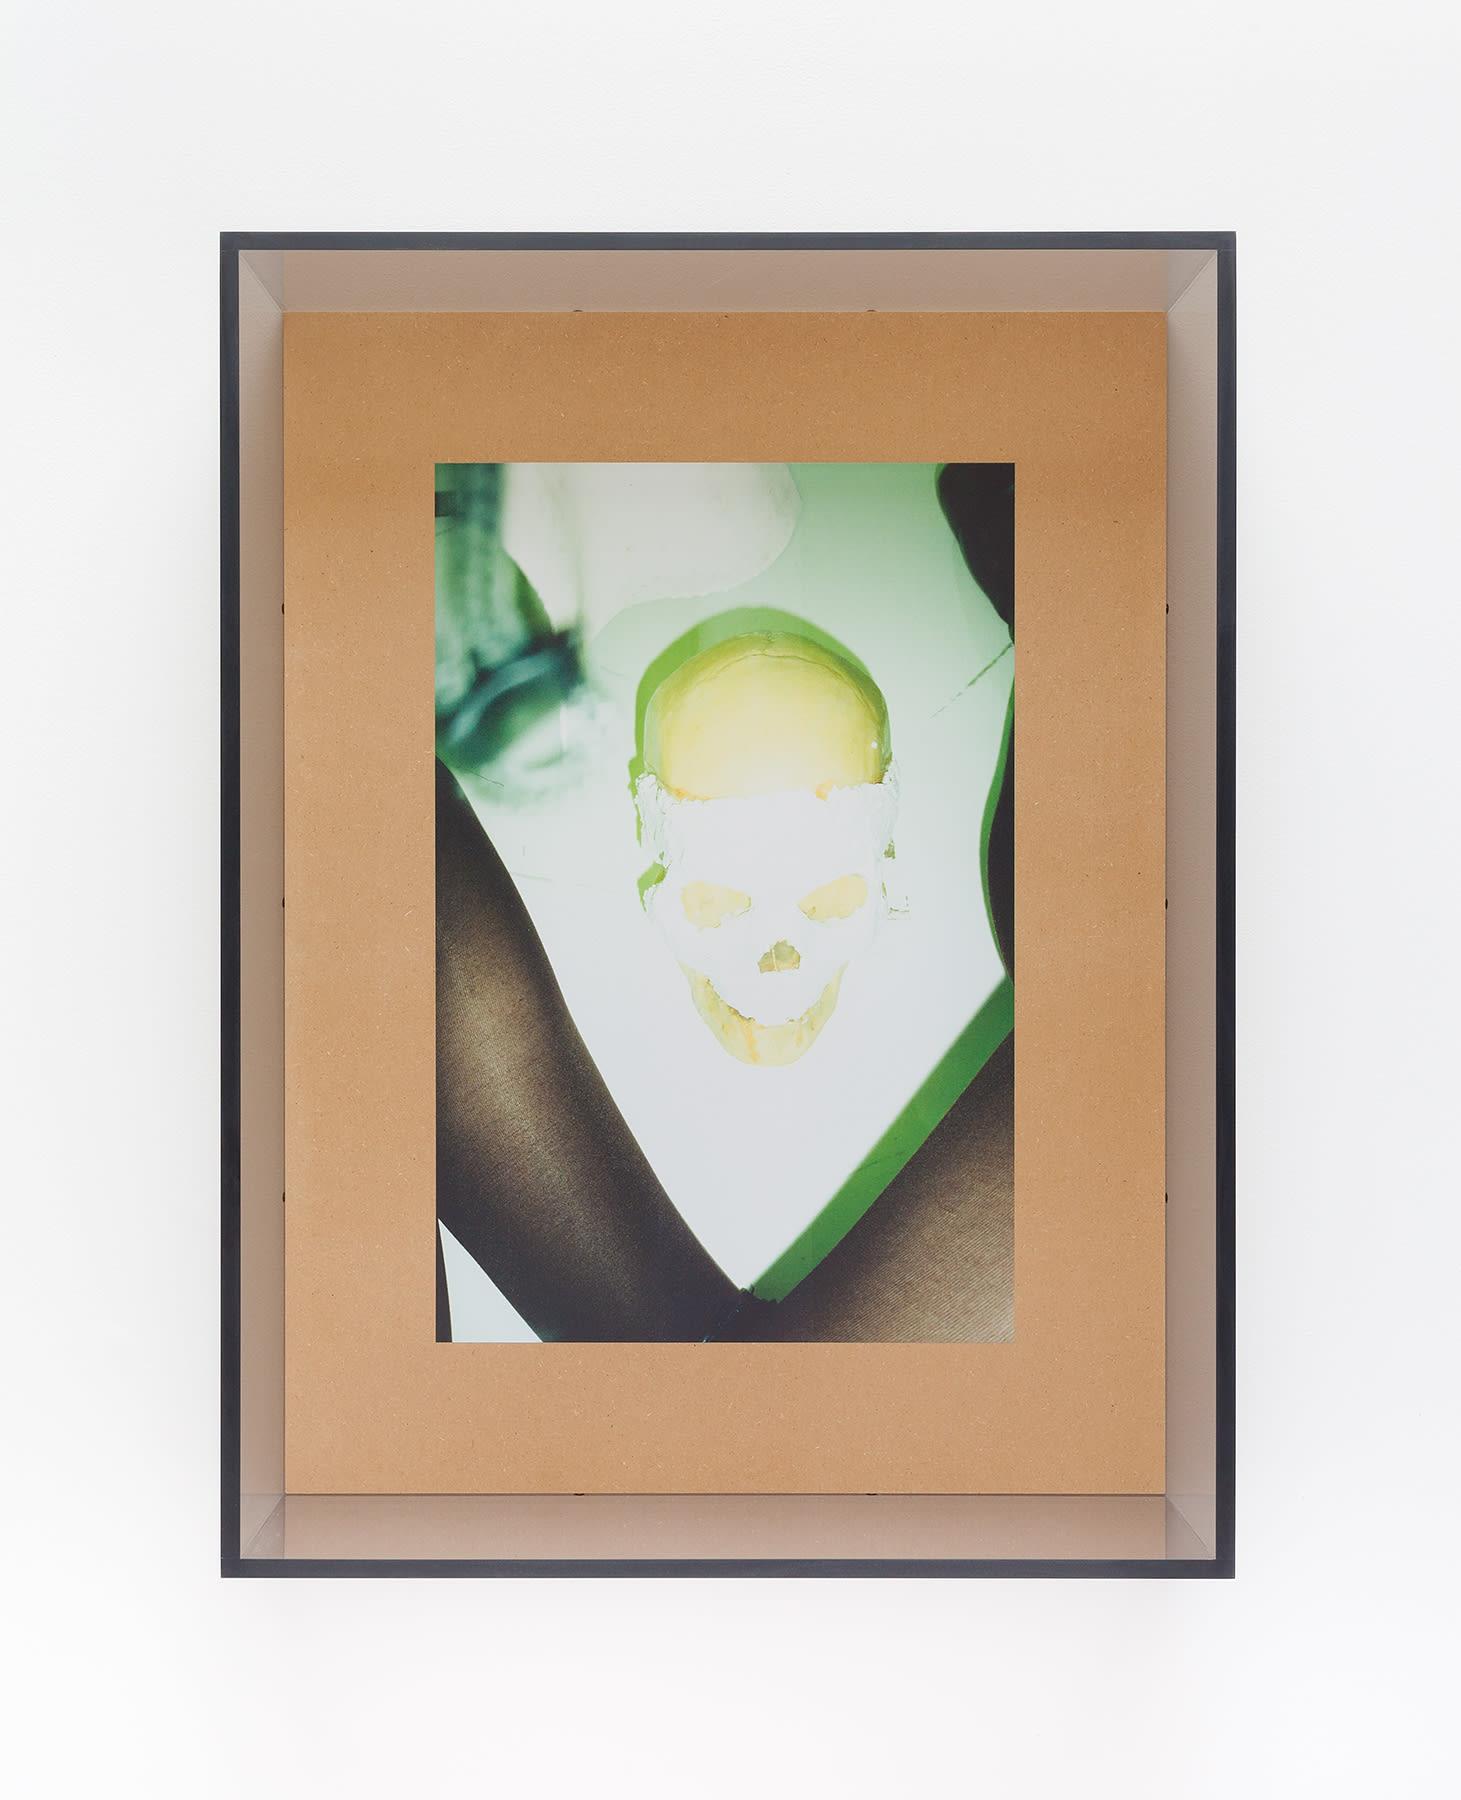 "<span class=""link fancybox-details-link""><a href=""/exhibitions/166/works/artworks15363/"">View Detail Page</a></span><div class=""artist""><strong>B. Ingrid Olson</strong></div><div class=""title""><em>Whet Grin Waning Crown</em>, 2017</div><div class=""medium"">UV printed MDF, PVA size, plexiglas, screws</div><div class=""dimensions"">82,5 x 62,2 x 15,2 cm</div>"